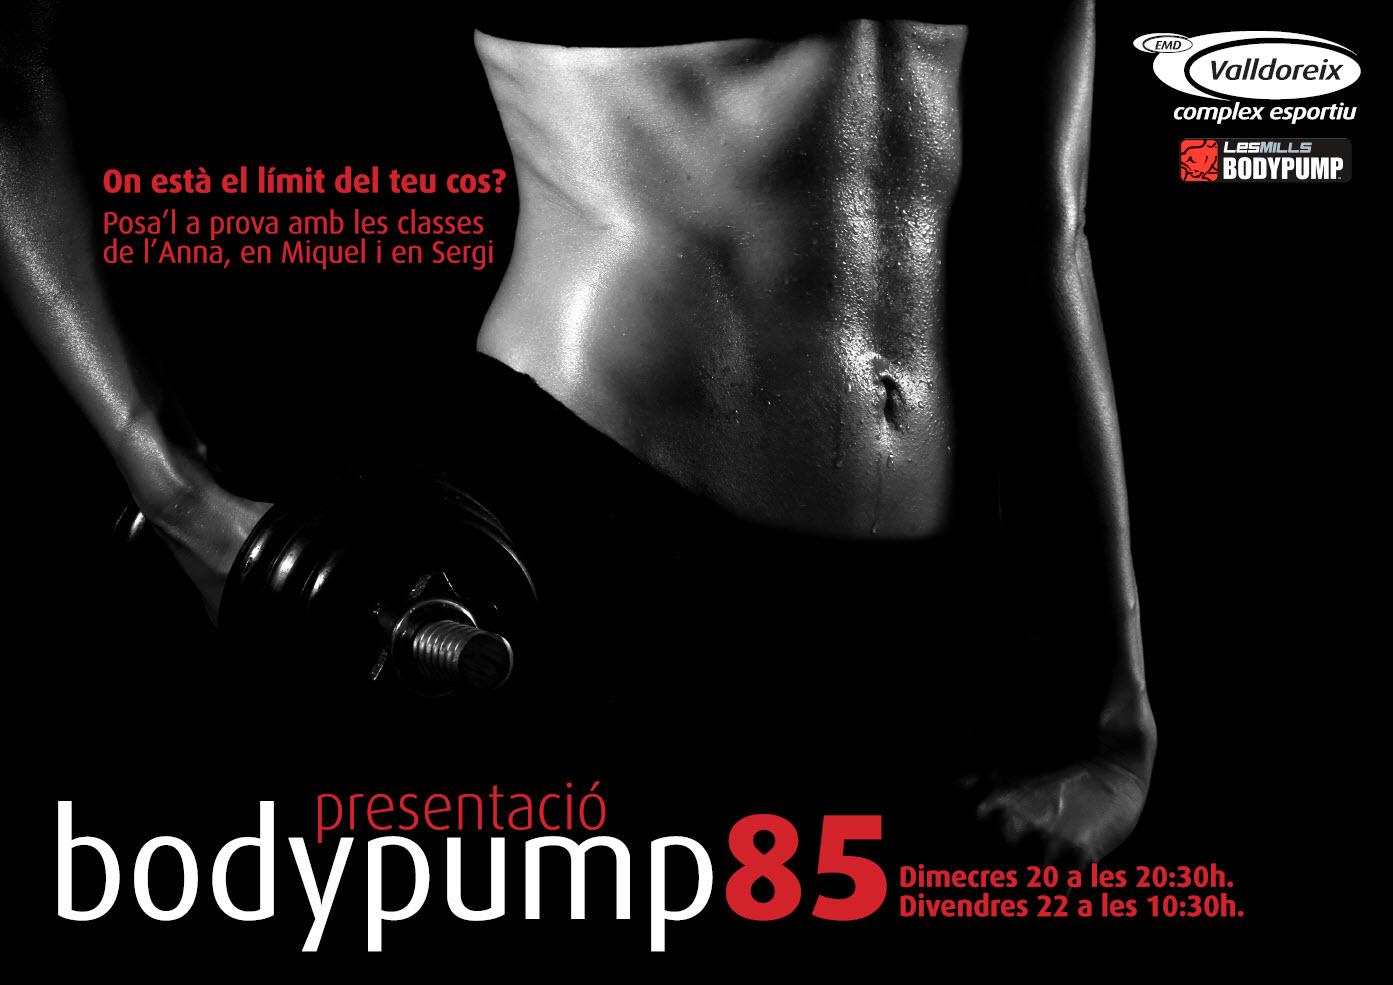 Presentación de la Body Pump 85 | Complex Esportiu EMD Valldoreix ...